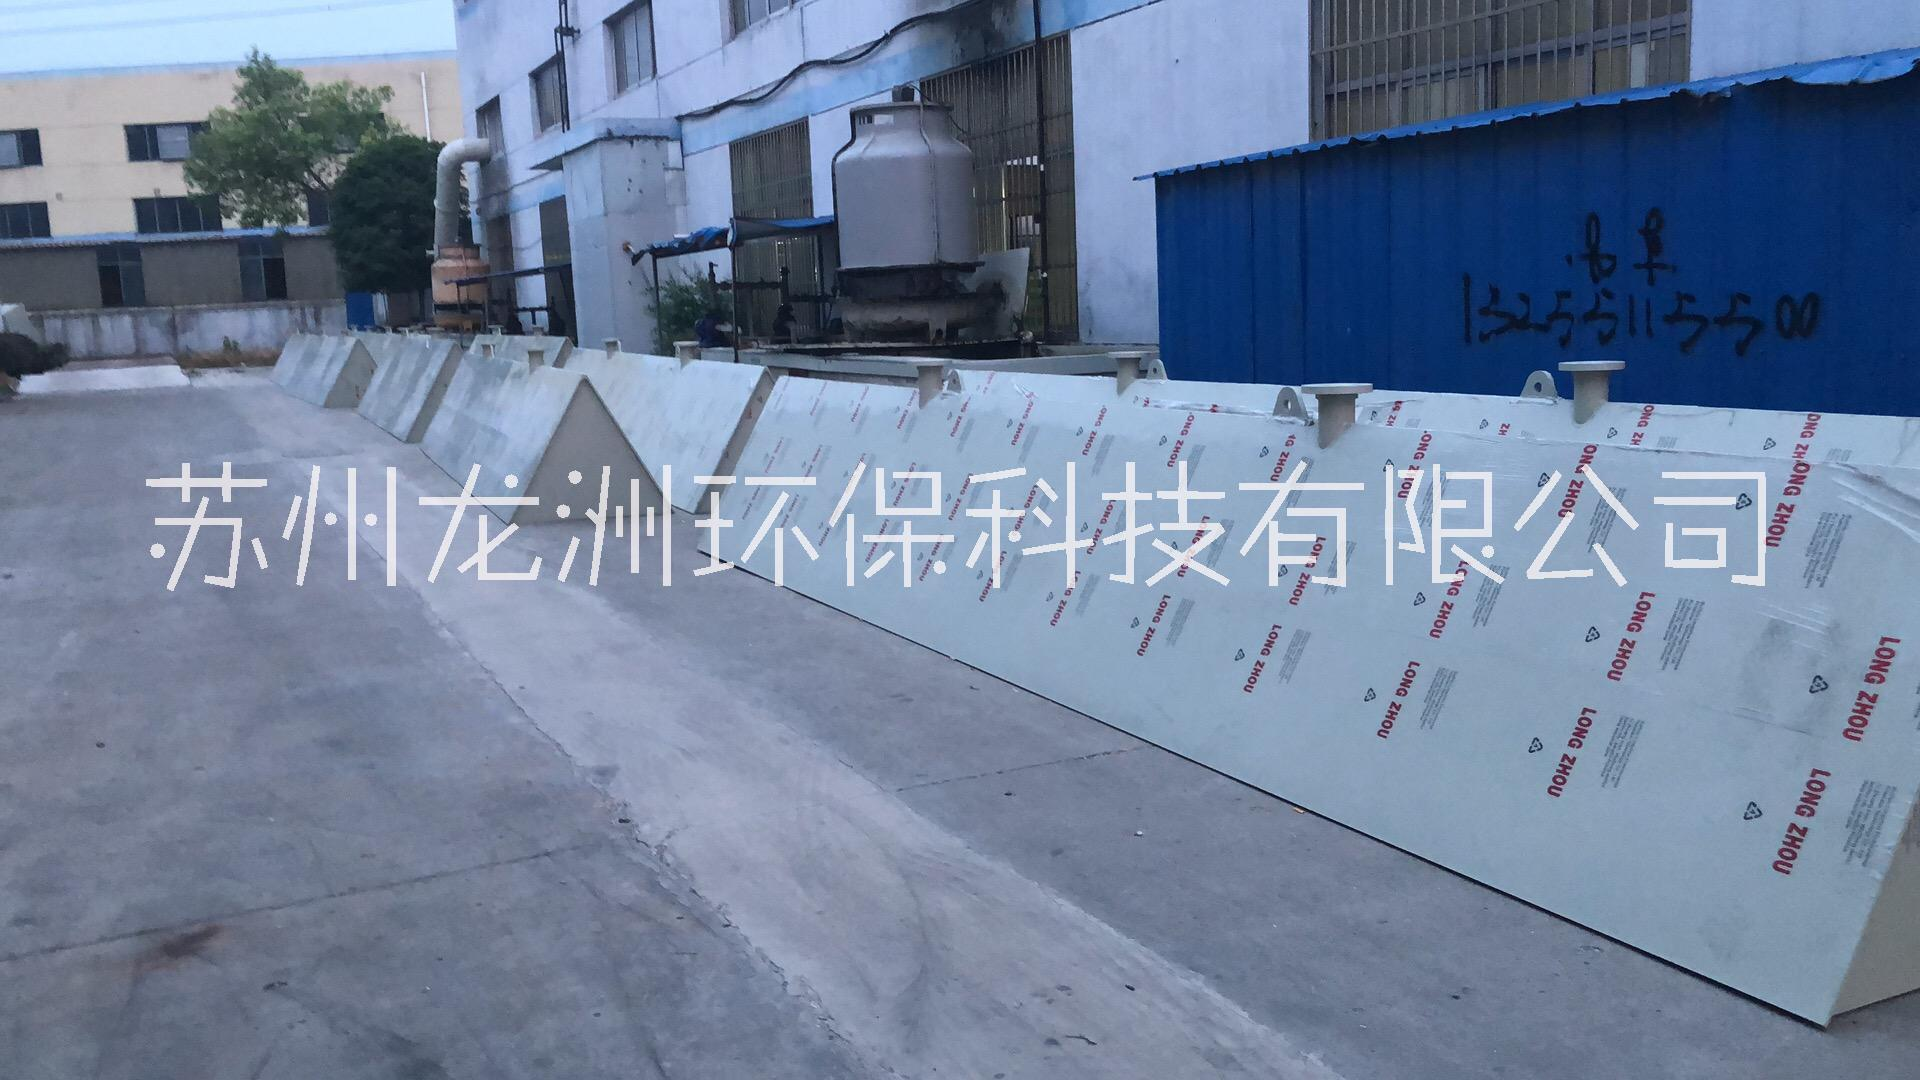 PP制品加工焊接,PP板制品焊接,PP塑料板焊接制品加工,PP板厂家直销